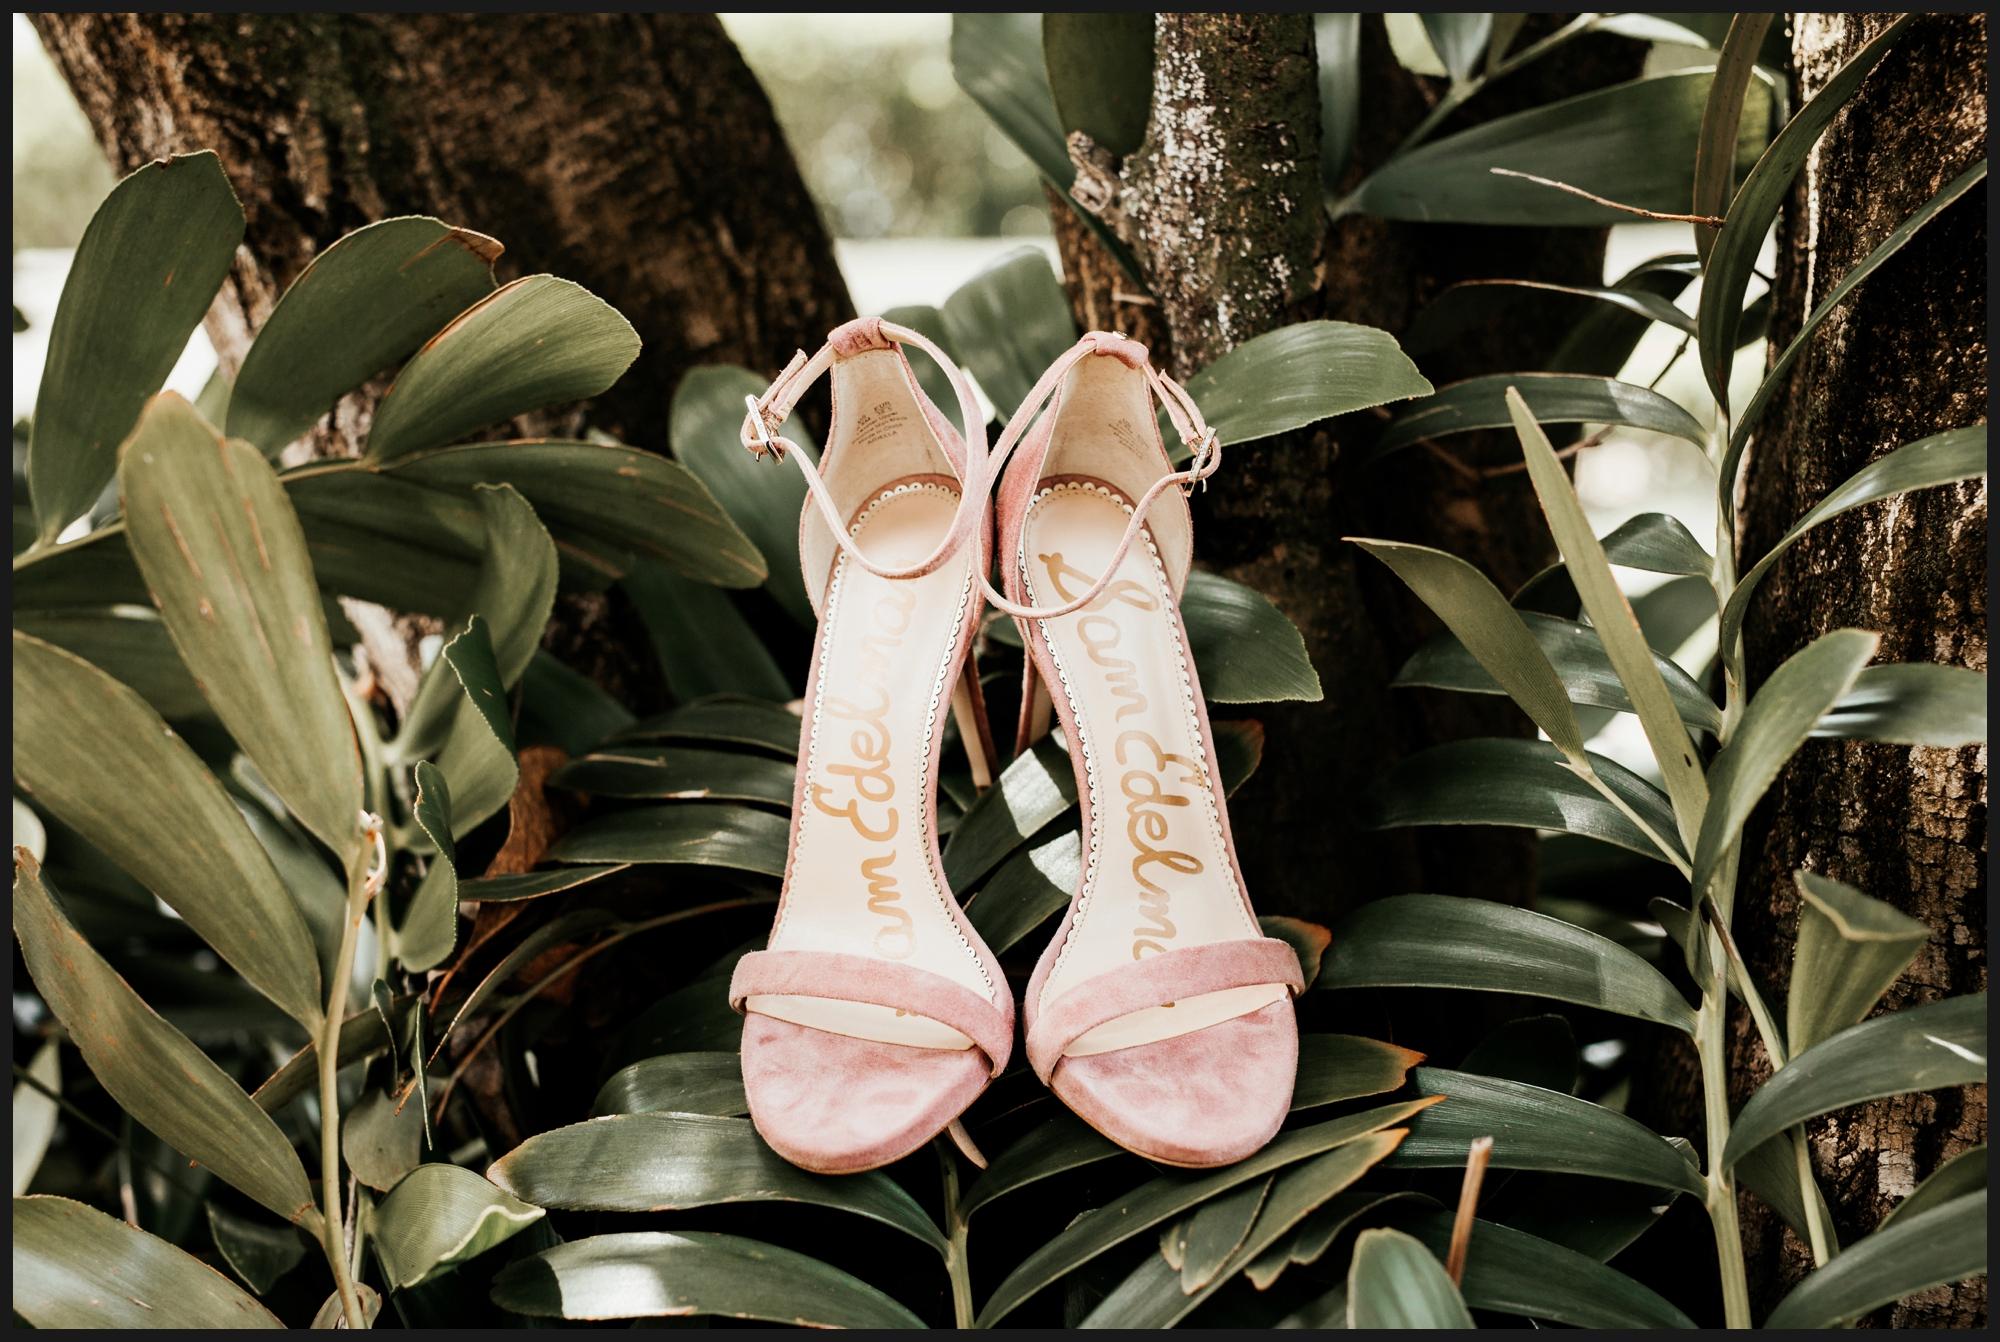 Orlando-Wedding-Photographer-destination-wedding-photographer-florida-wedding-photographer-hawaii-wedding-photographer_0185.jpg